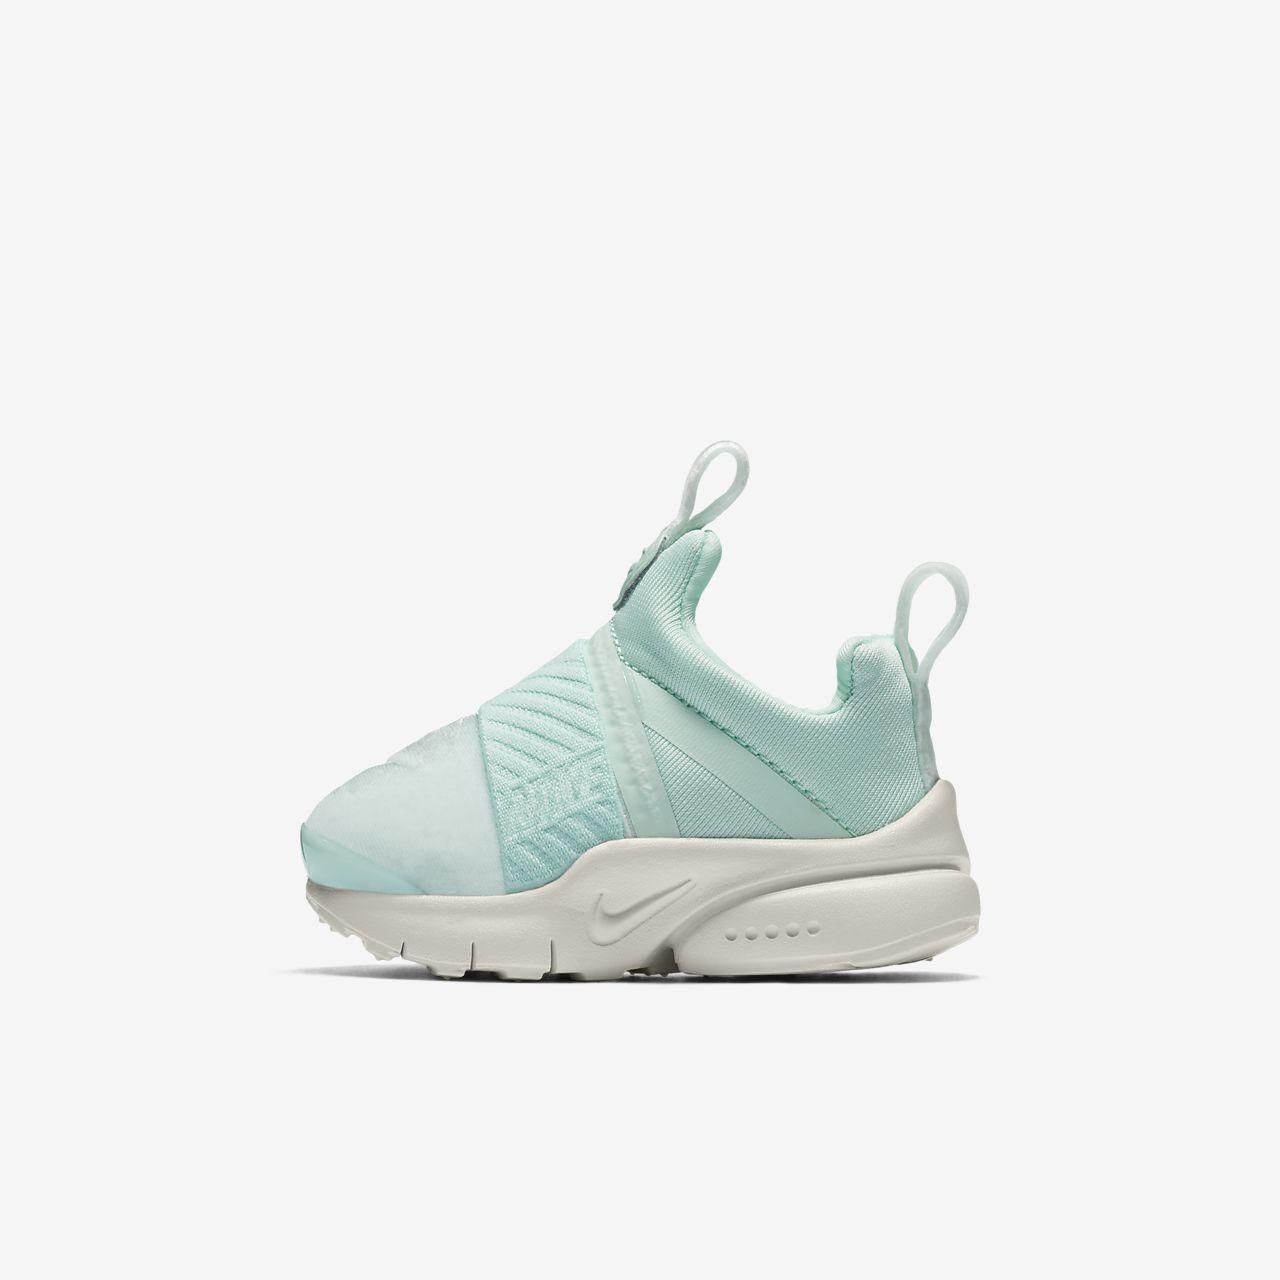 210d0f4b57d49 Nike Presto Extreme SE Infant Toddler Shoe